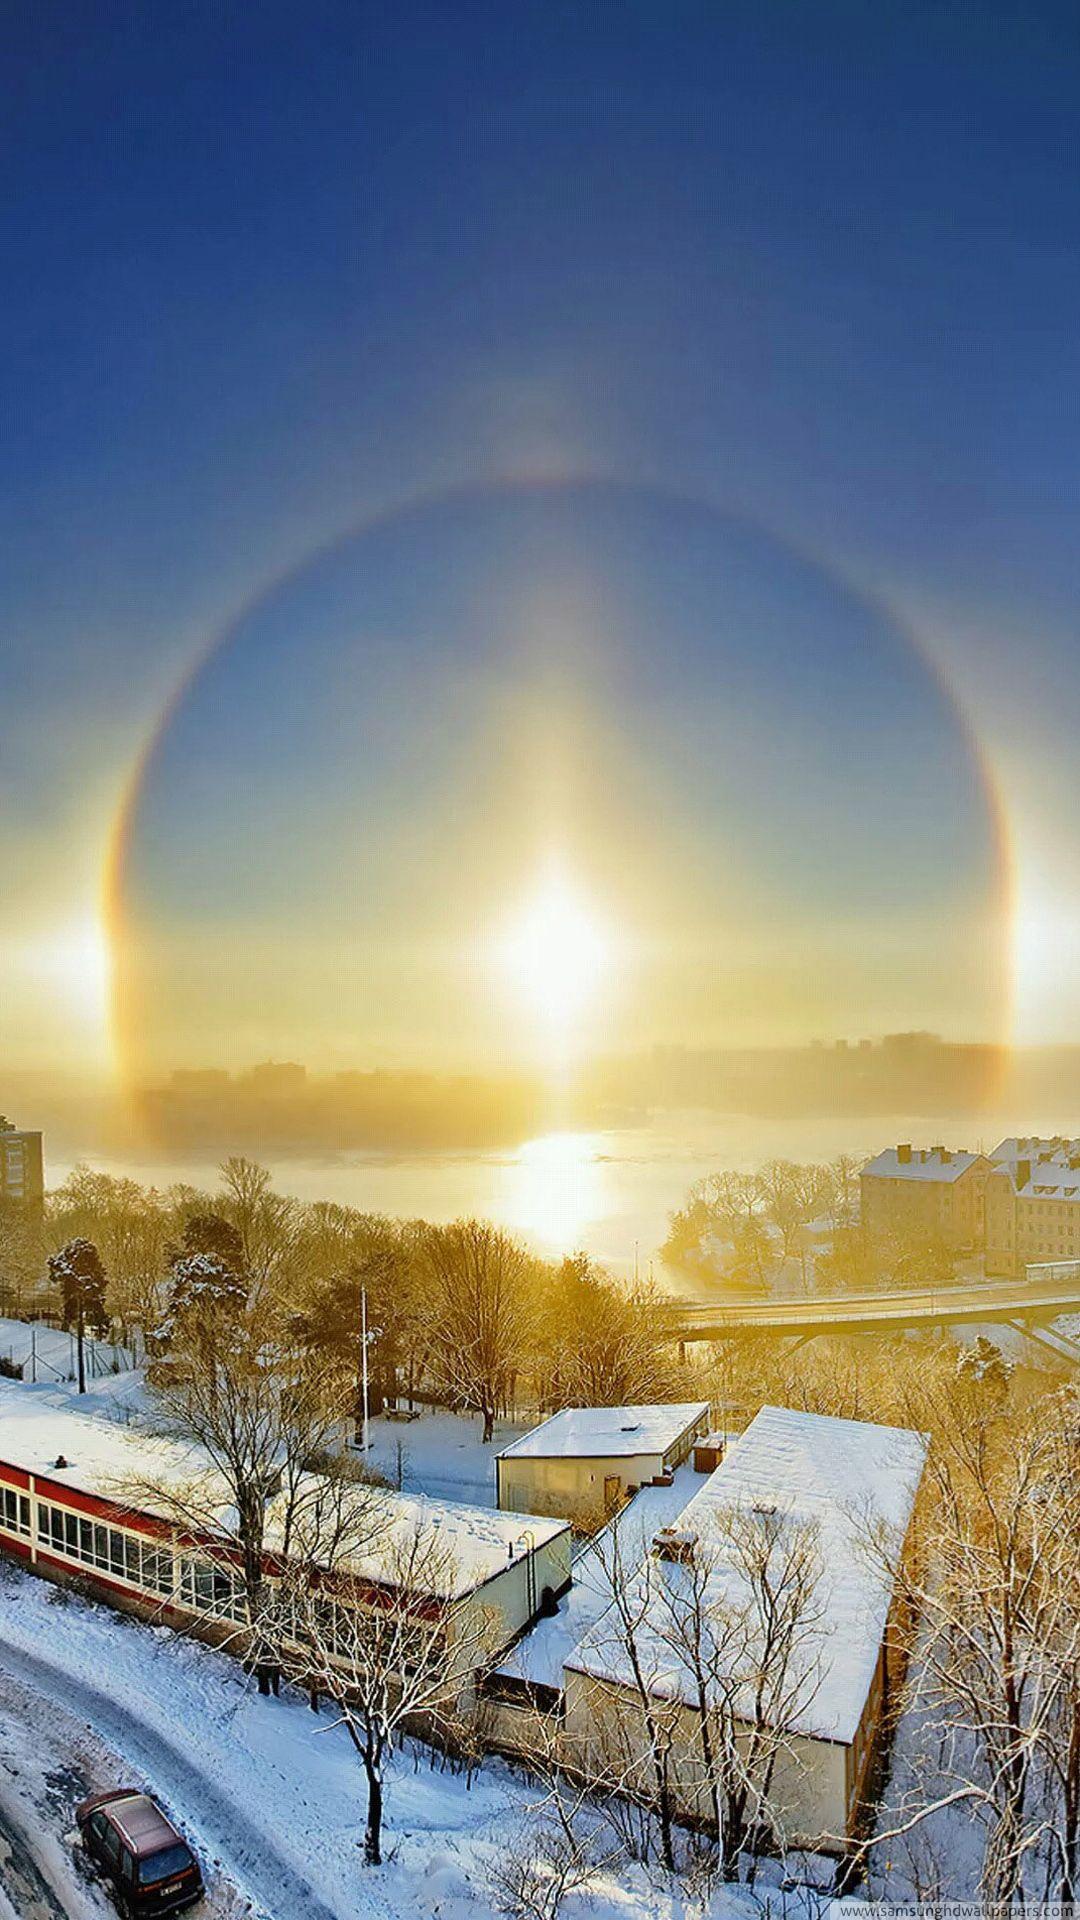 Winter town warm sunshine HD Samsung S4 wallpaper 1080x1920